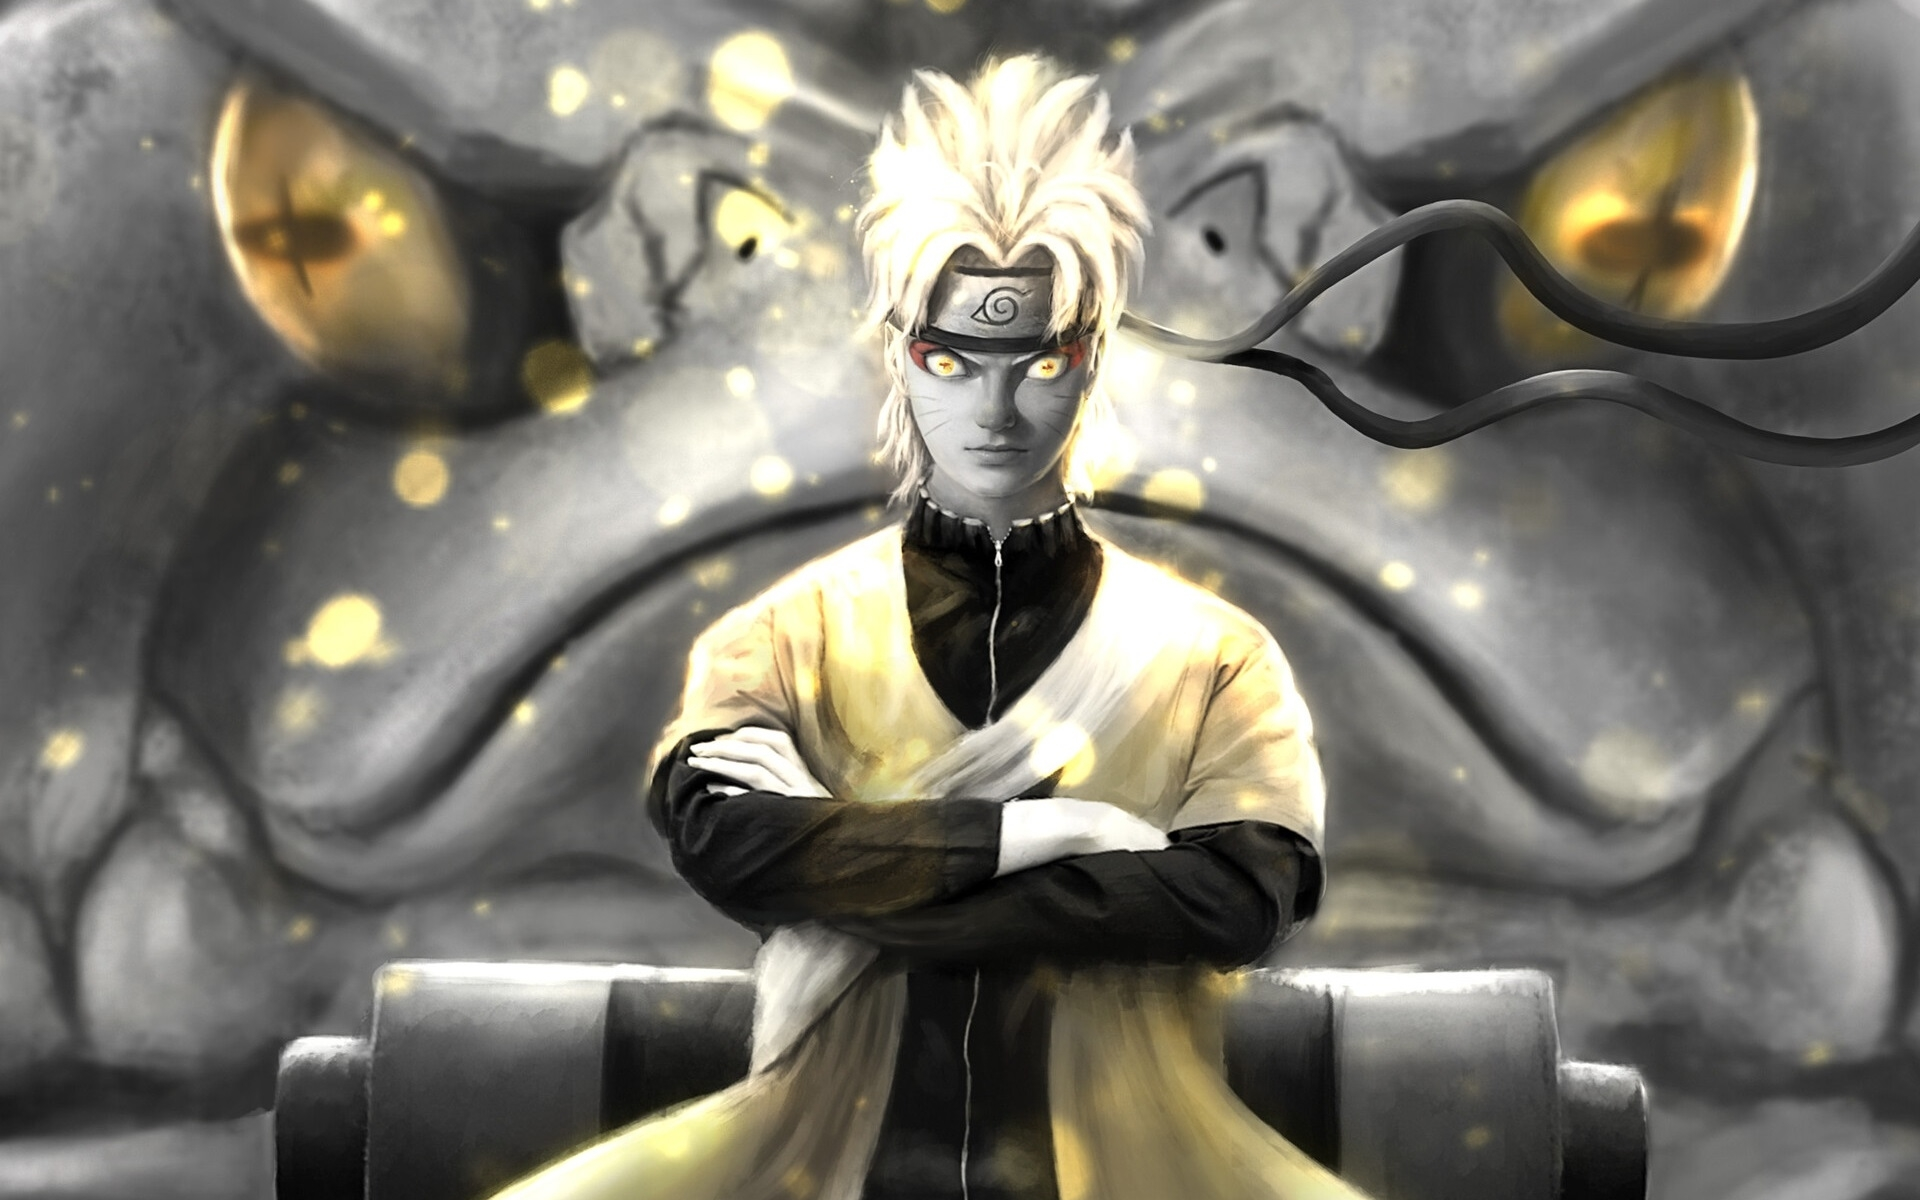 1920x1200 Naruto Uzumaki Orange Eyes 1200P Wallpaper, HD ...